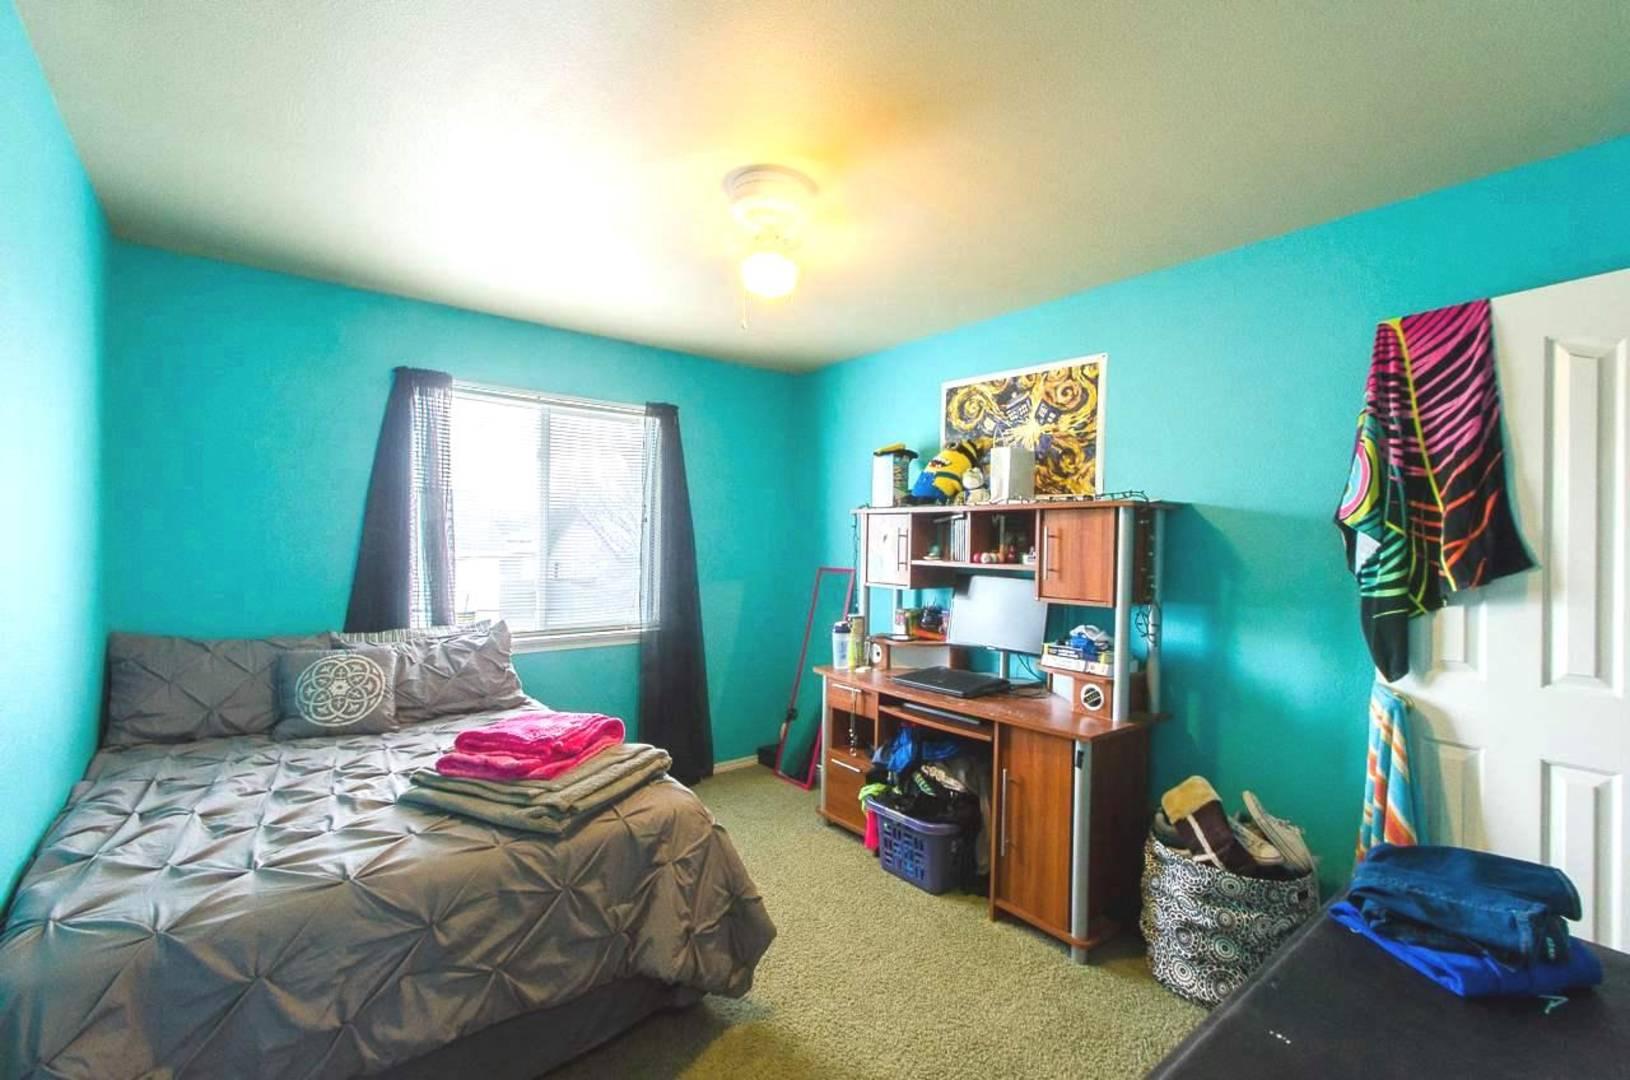 4498 S. Danridge Avenue Boise, ID 83716